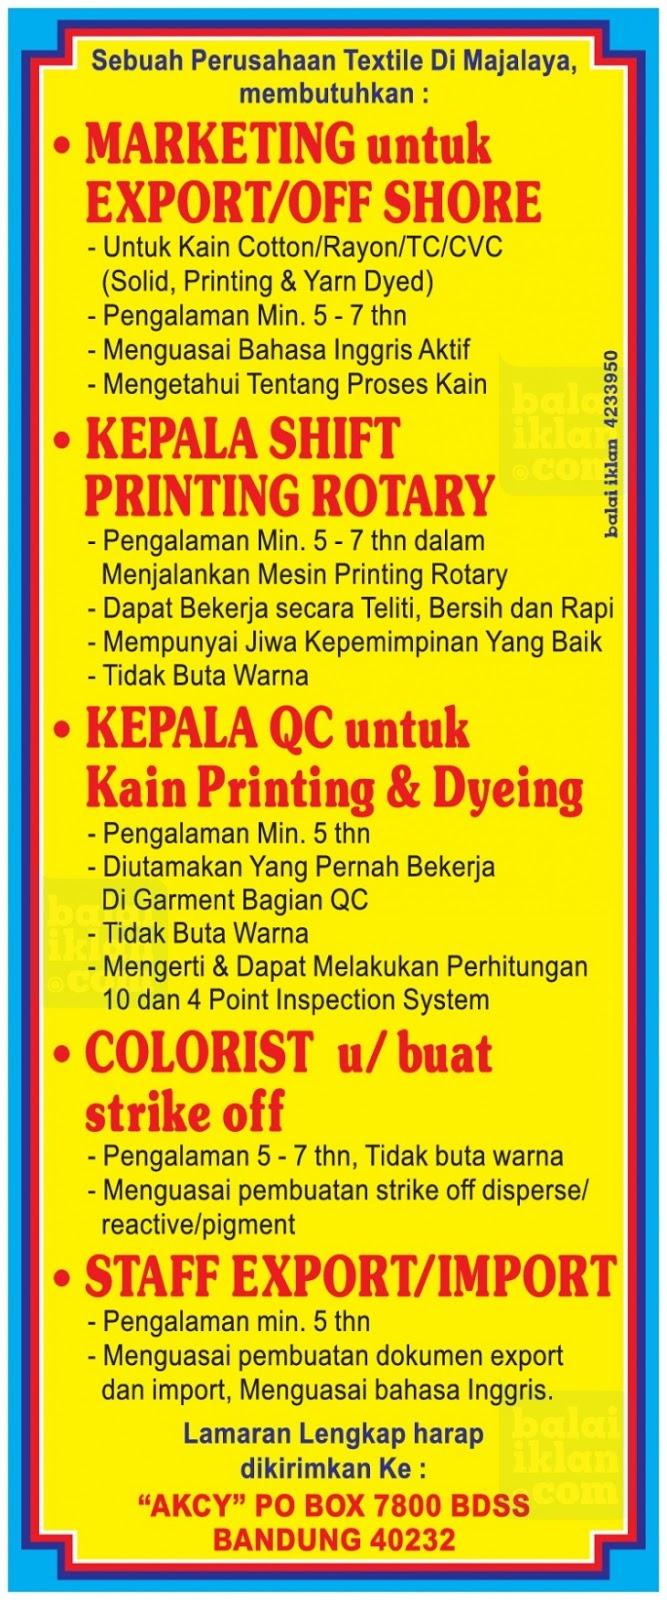 Lowongan Kerja Perusahaan Textile Majalaya Bandung Juni 2016